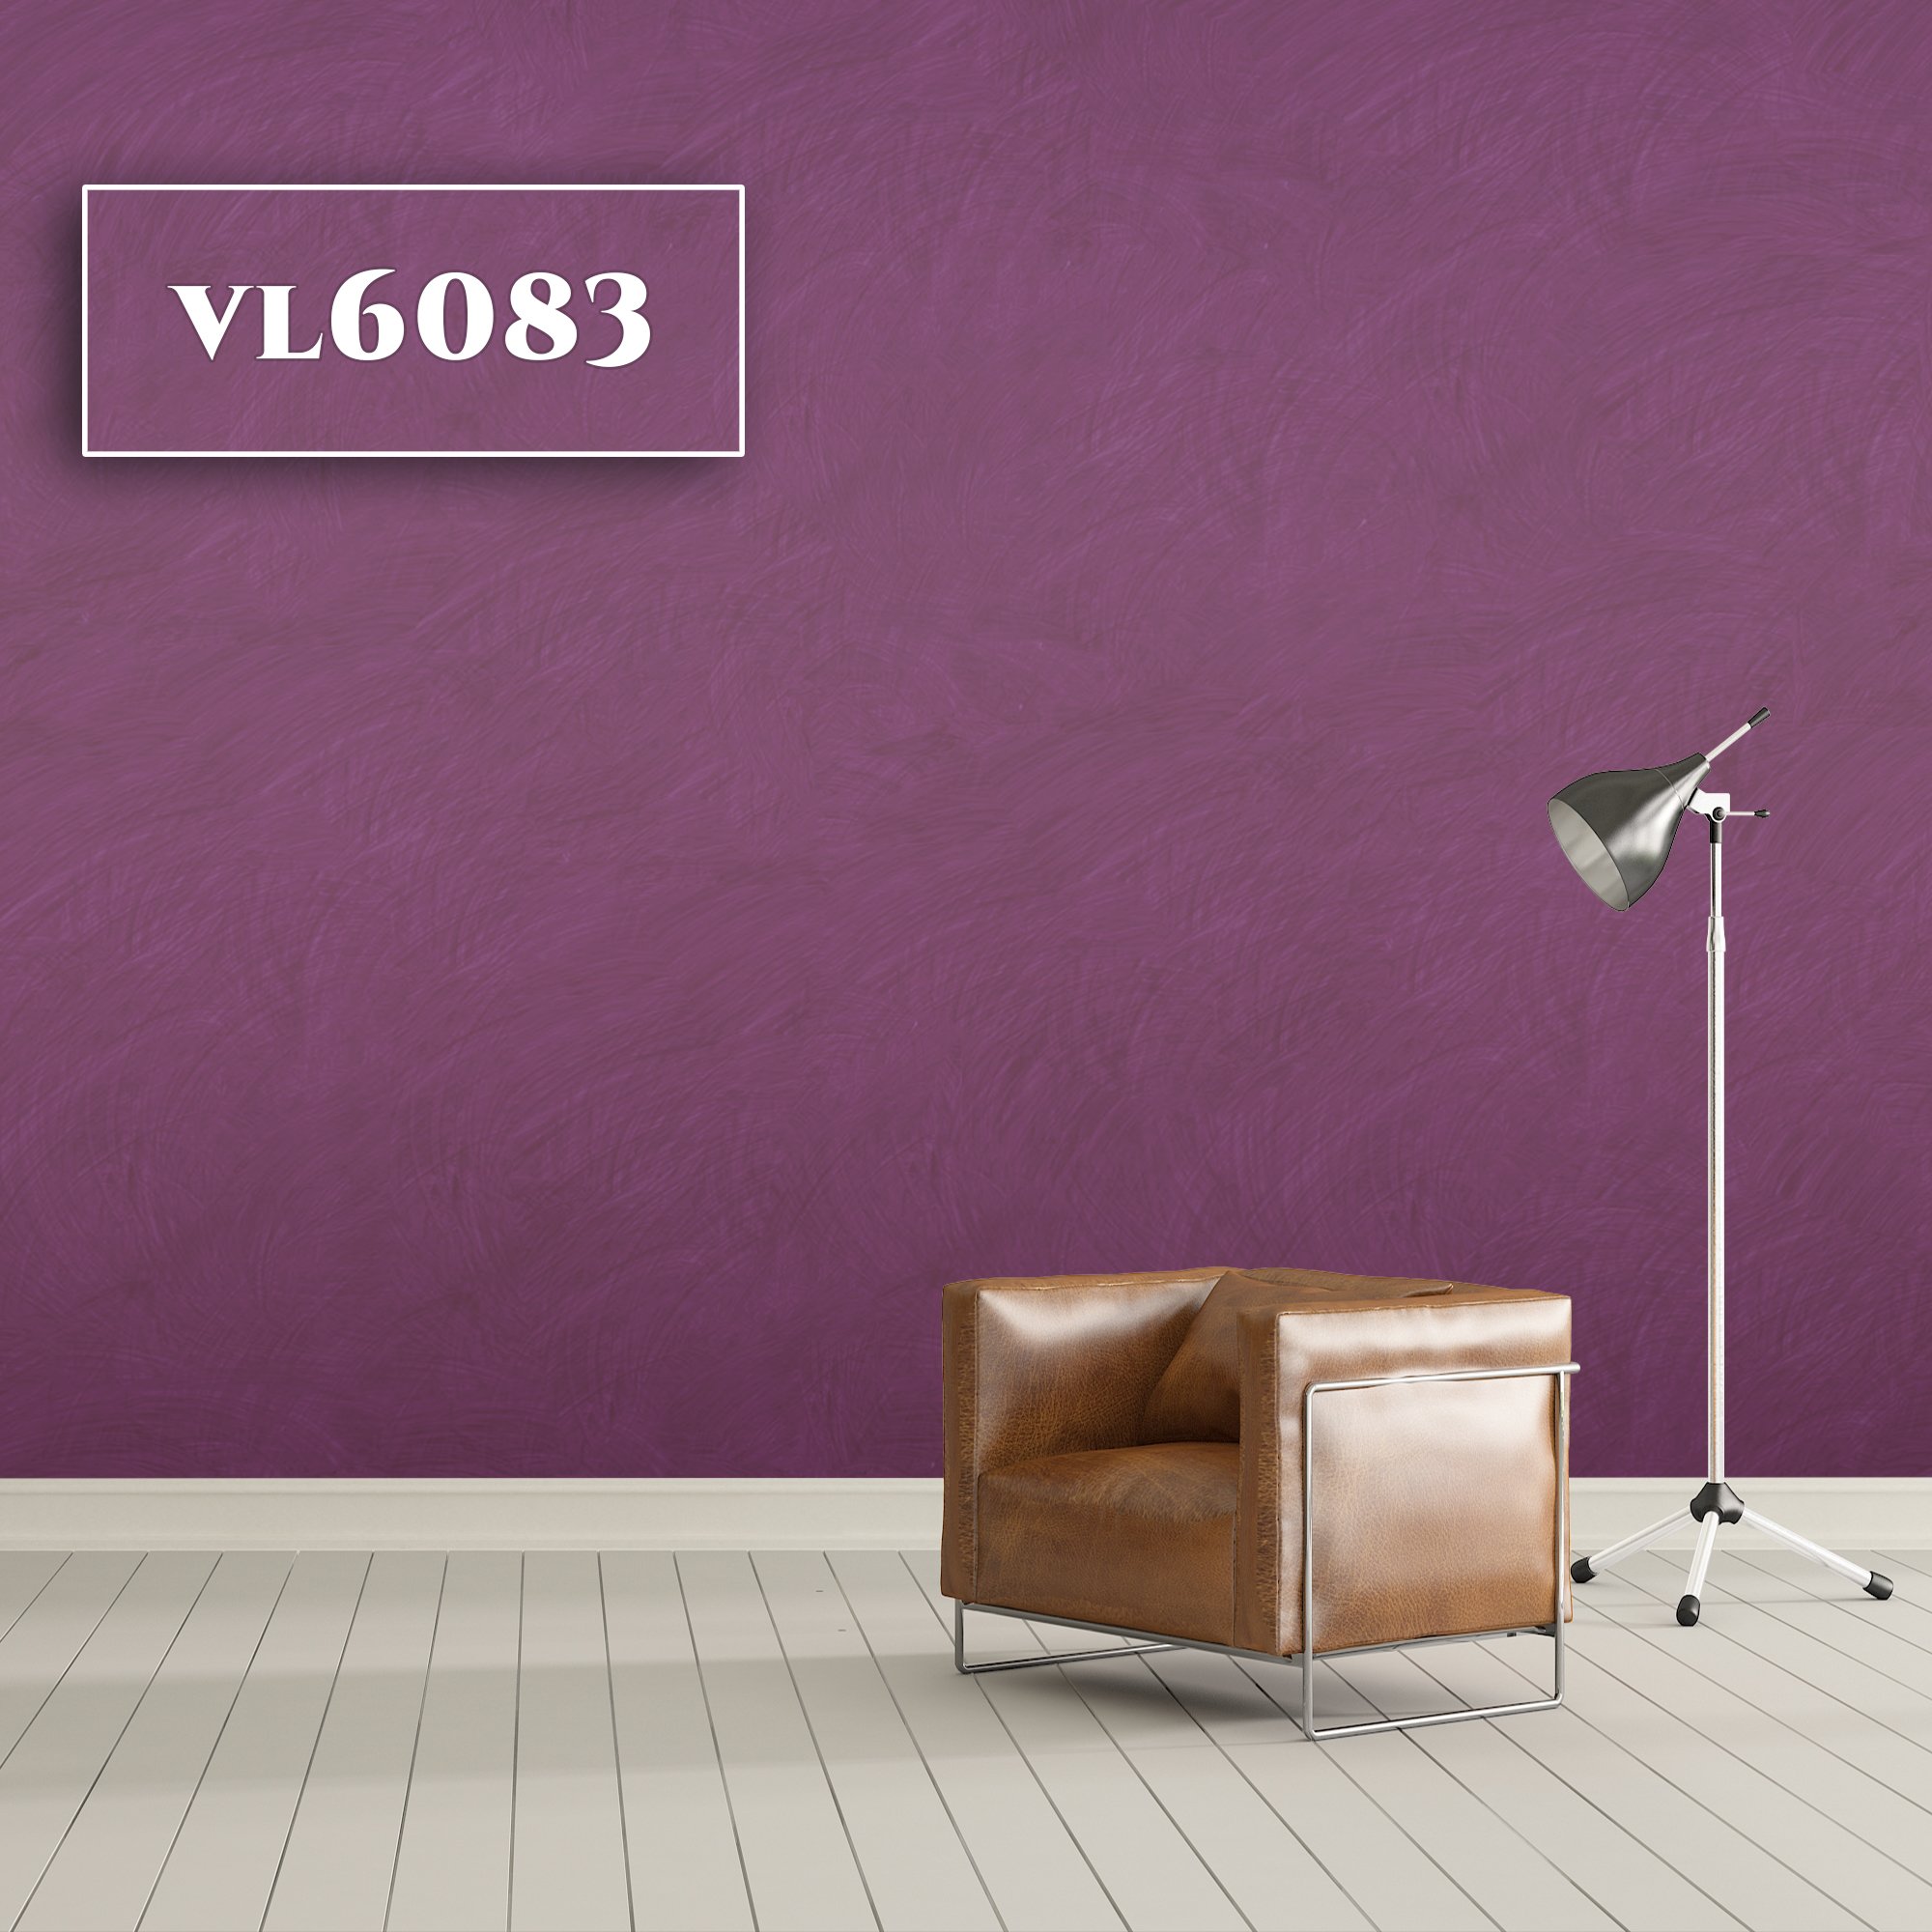 VL6083